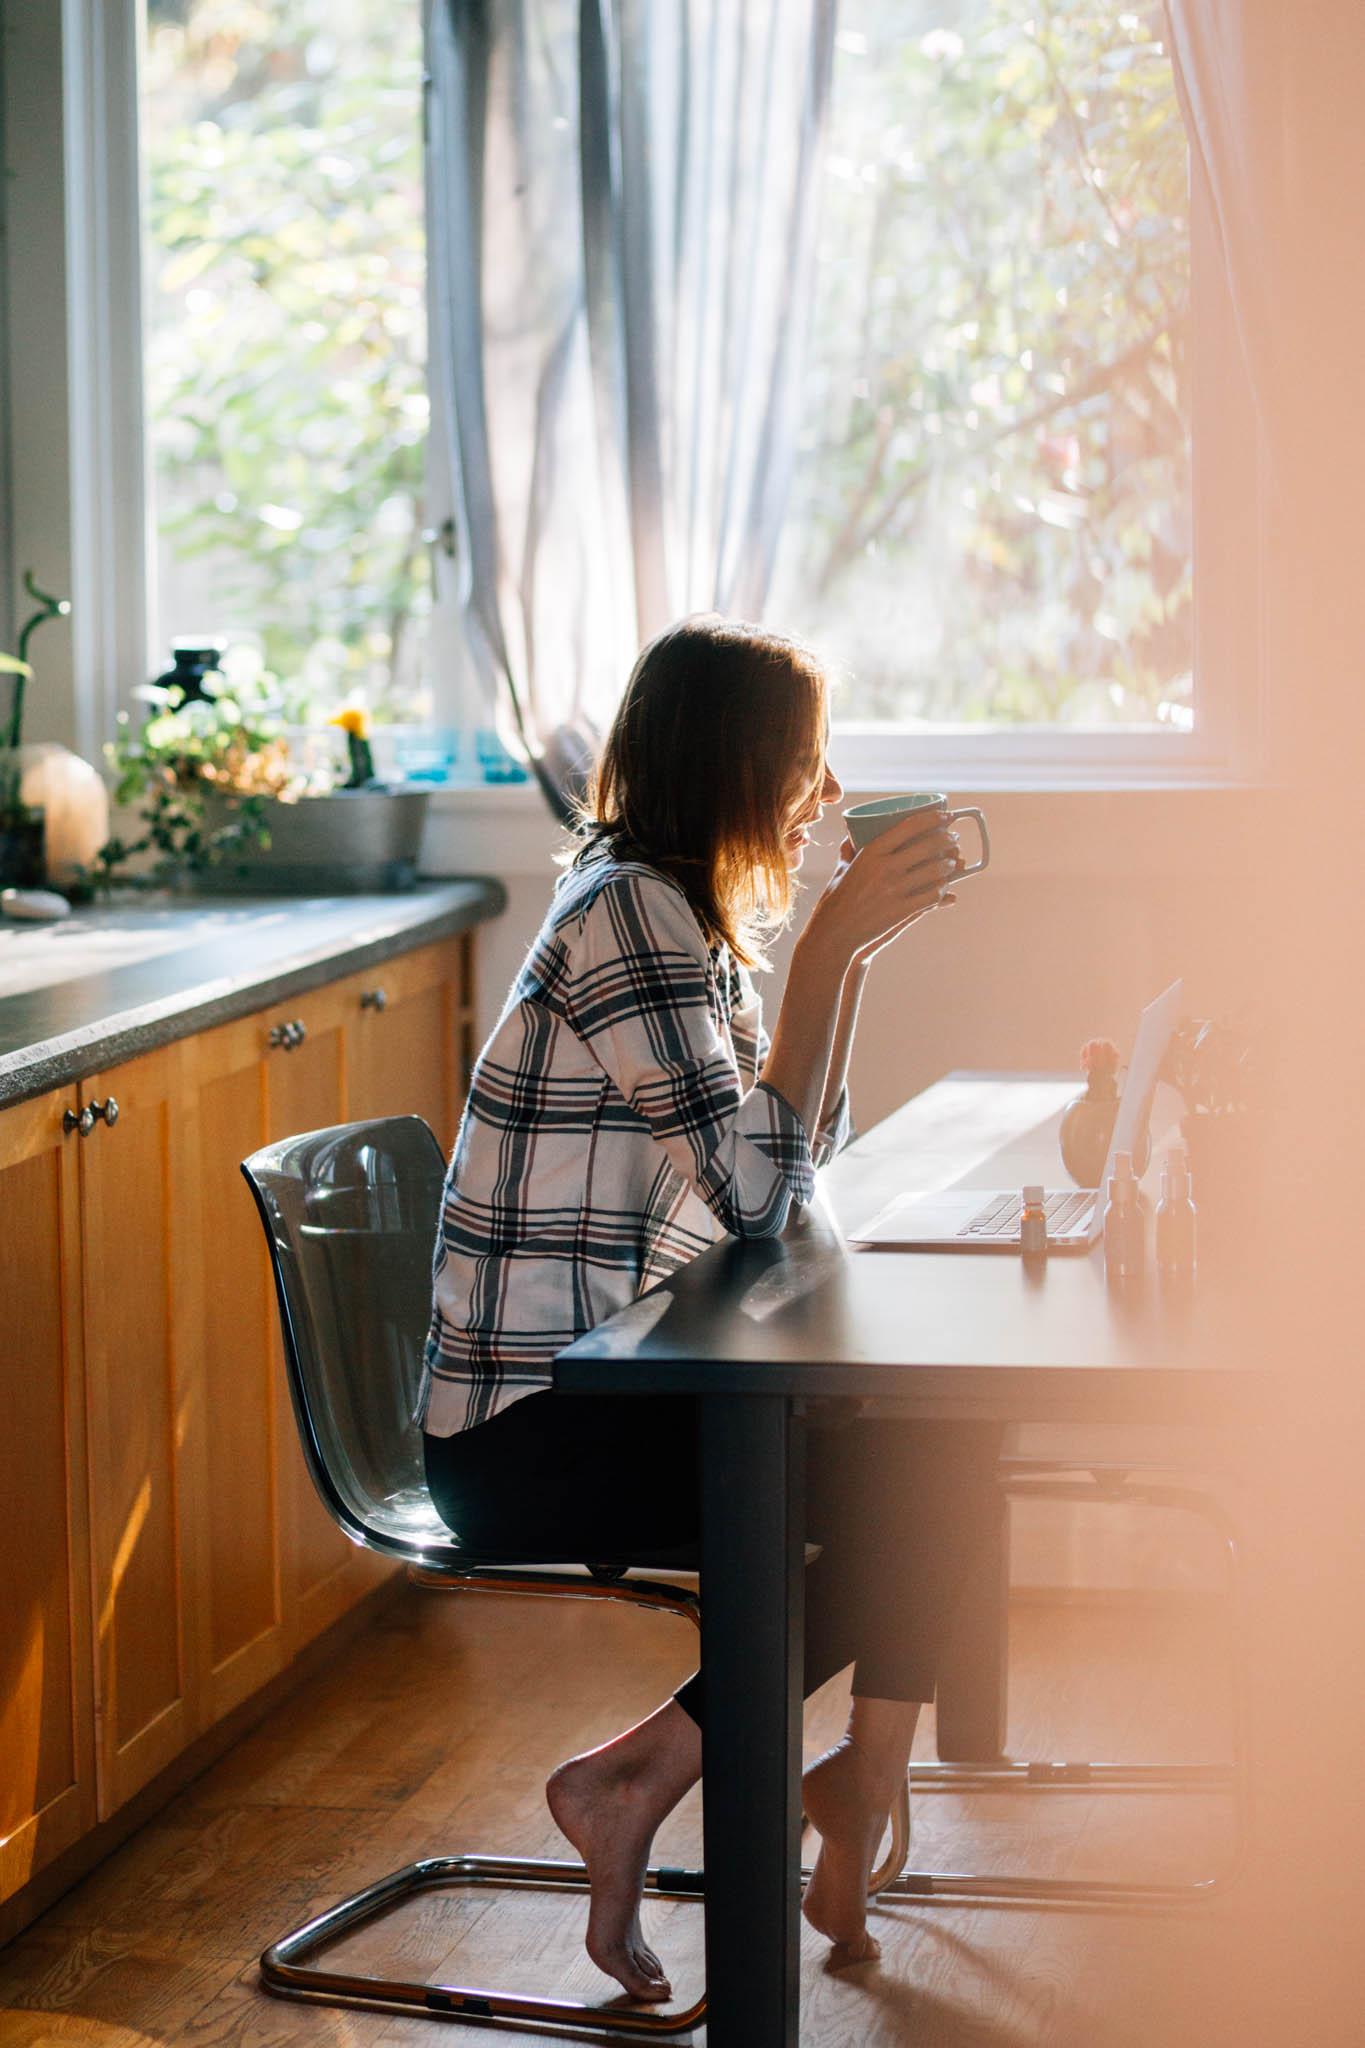 Vancouver Commercial lifestyle portrait photographer - Emmy Lou Virginia Photography-19.jpg